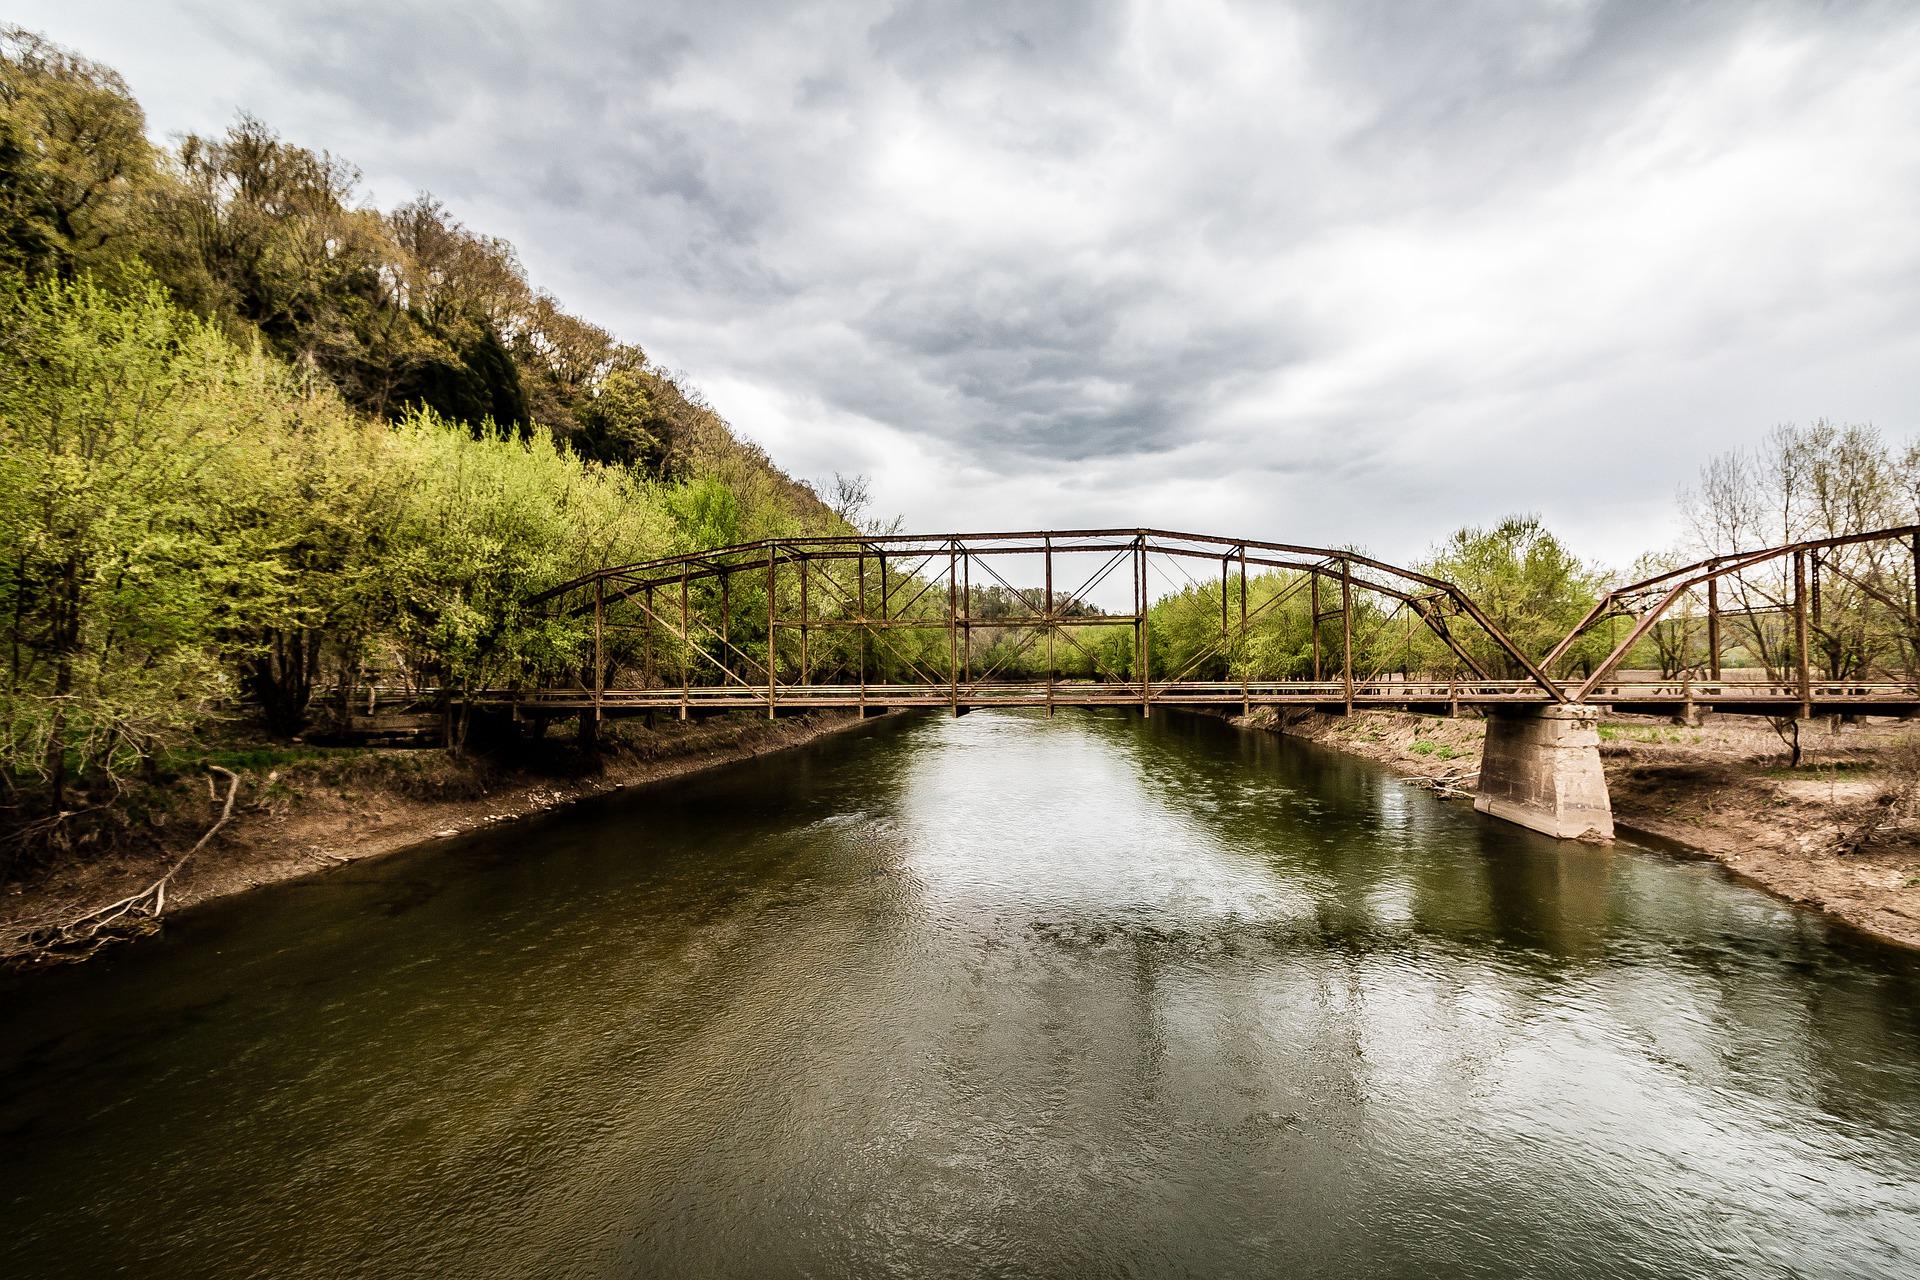 A railroad bridge stretches across a river.